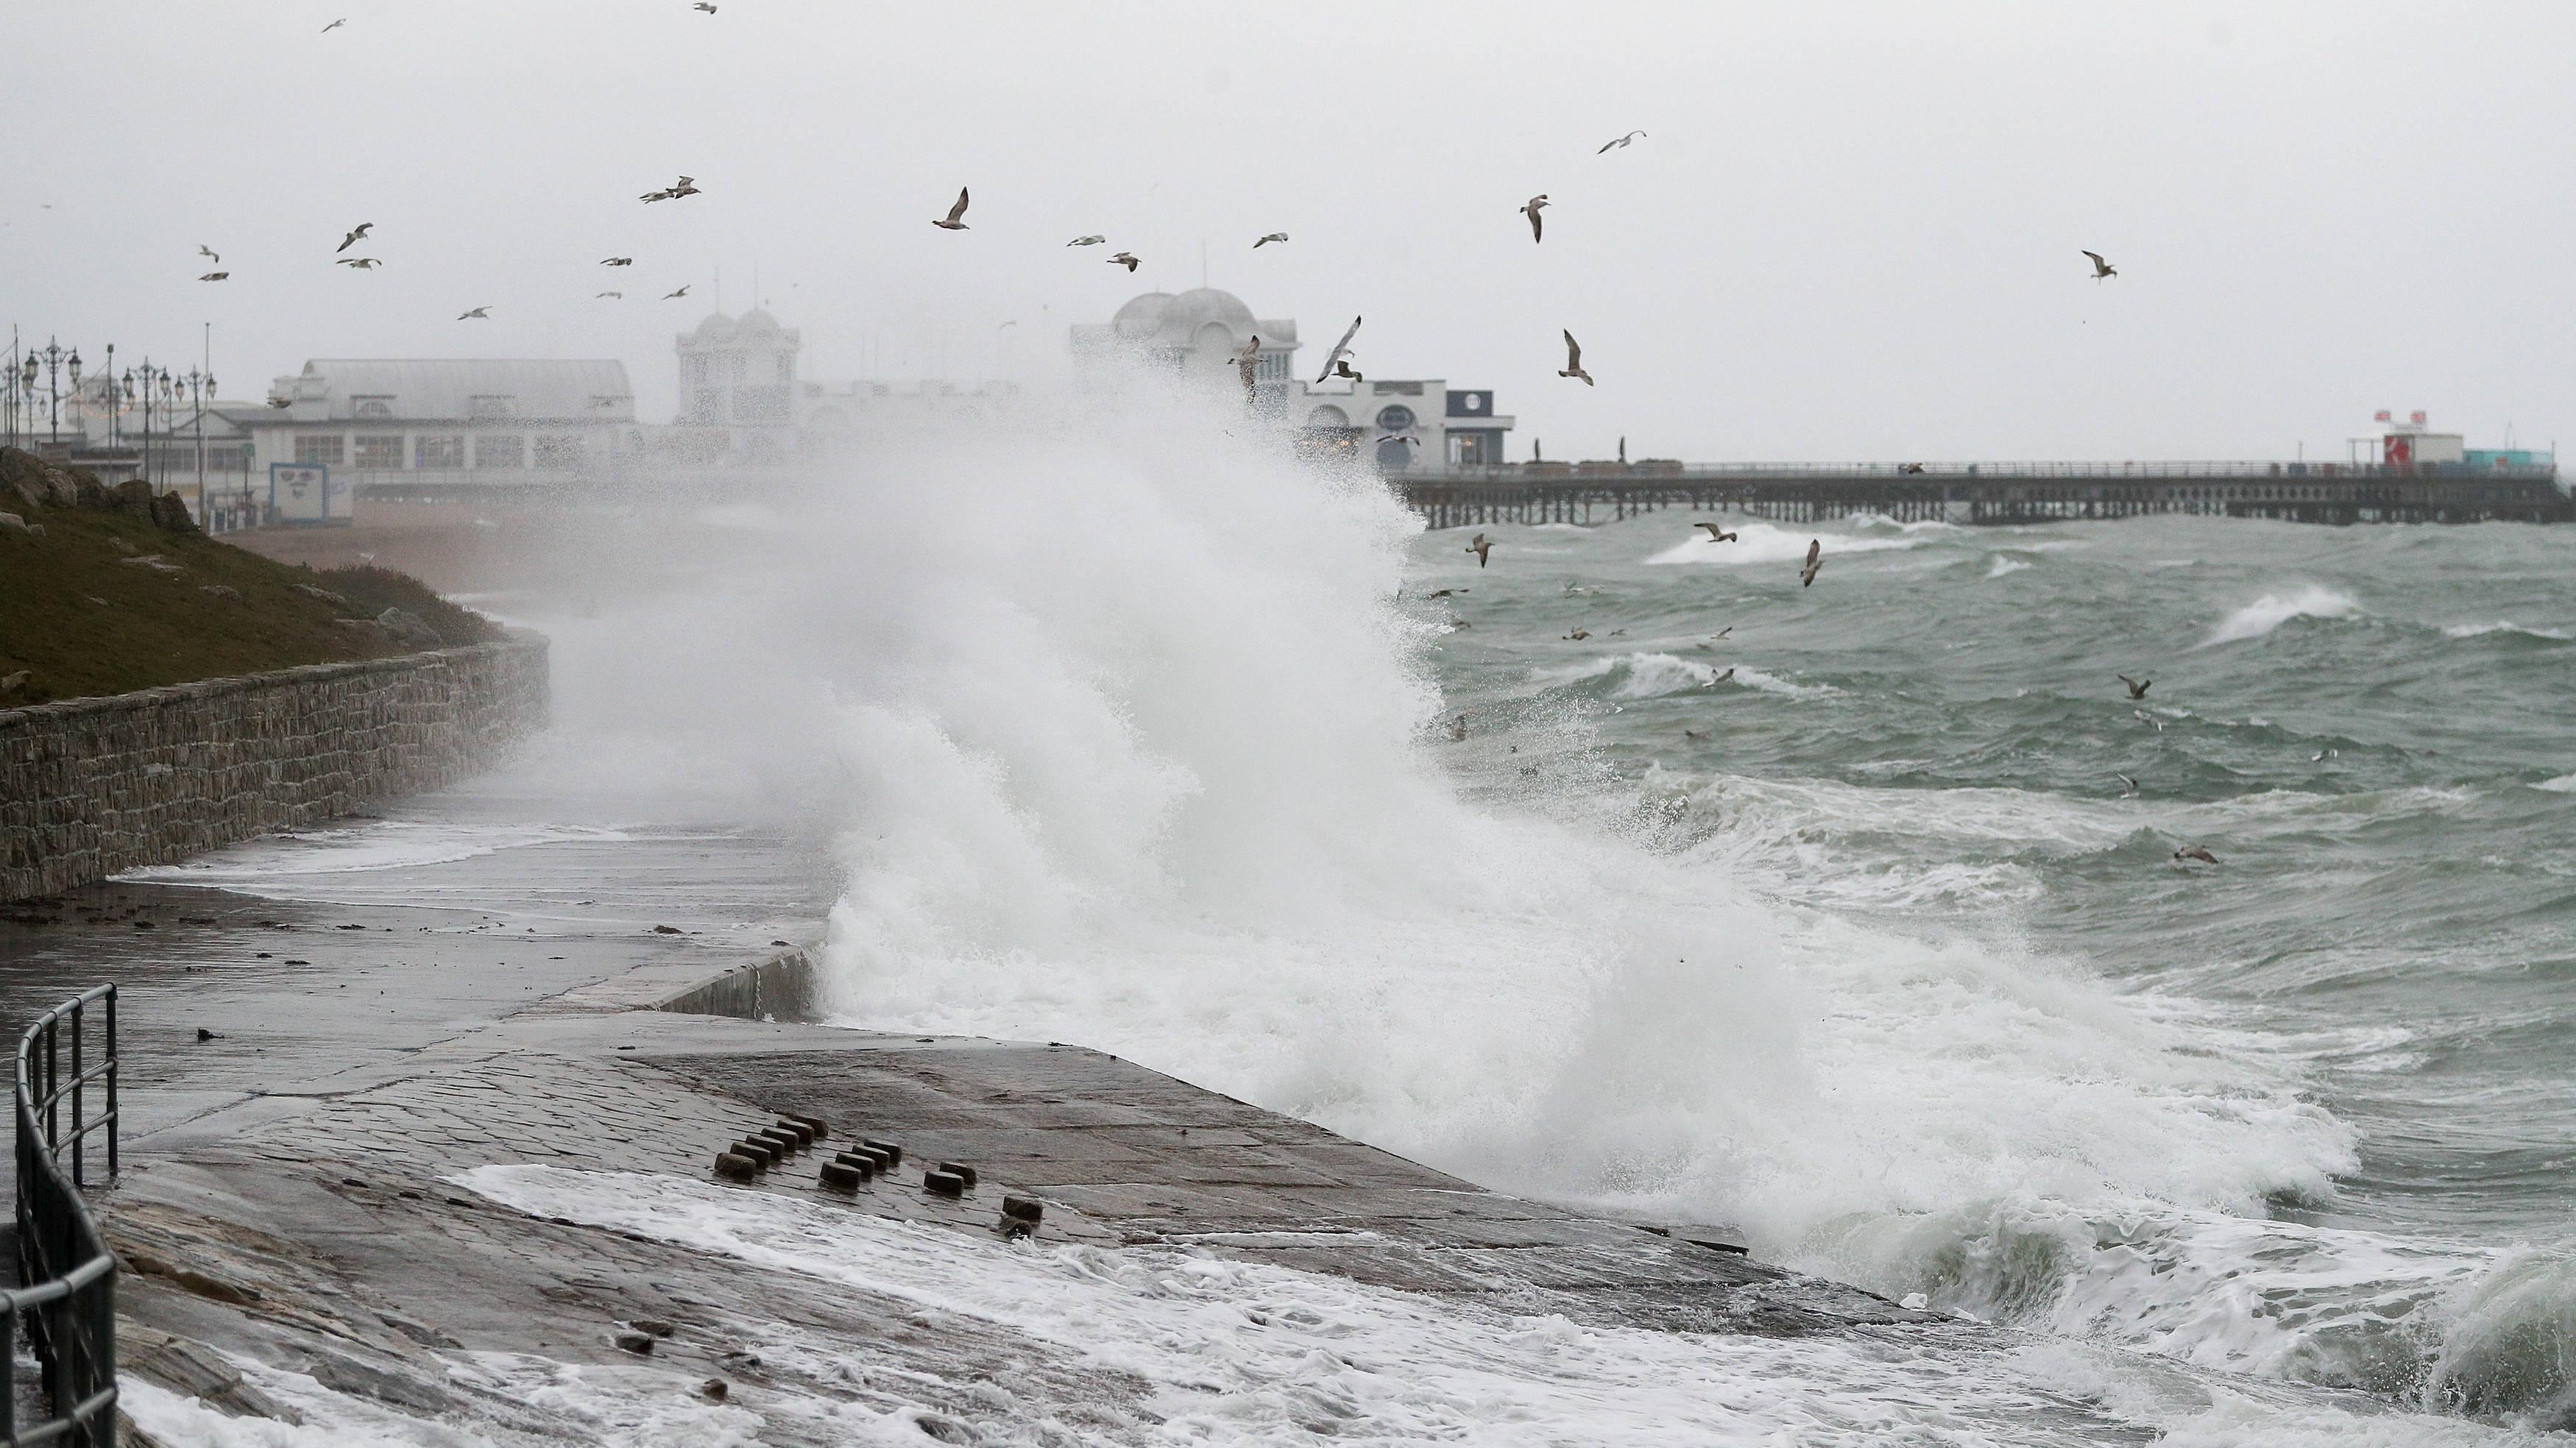 Storm Atiyah: Strong gales and heavy rain set to batter Britain